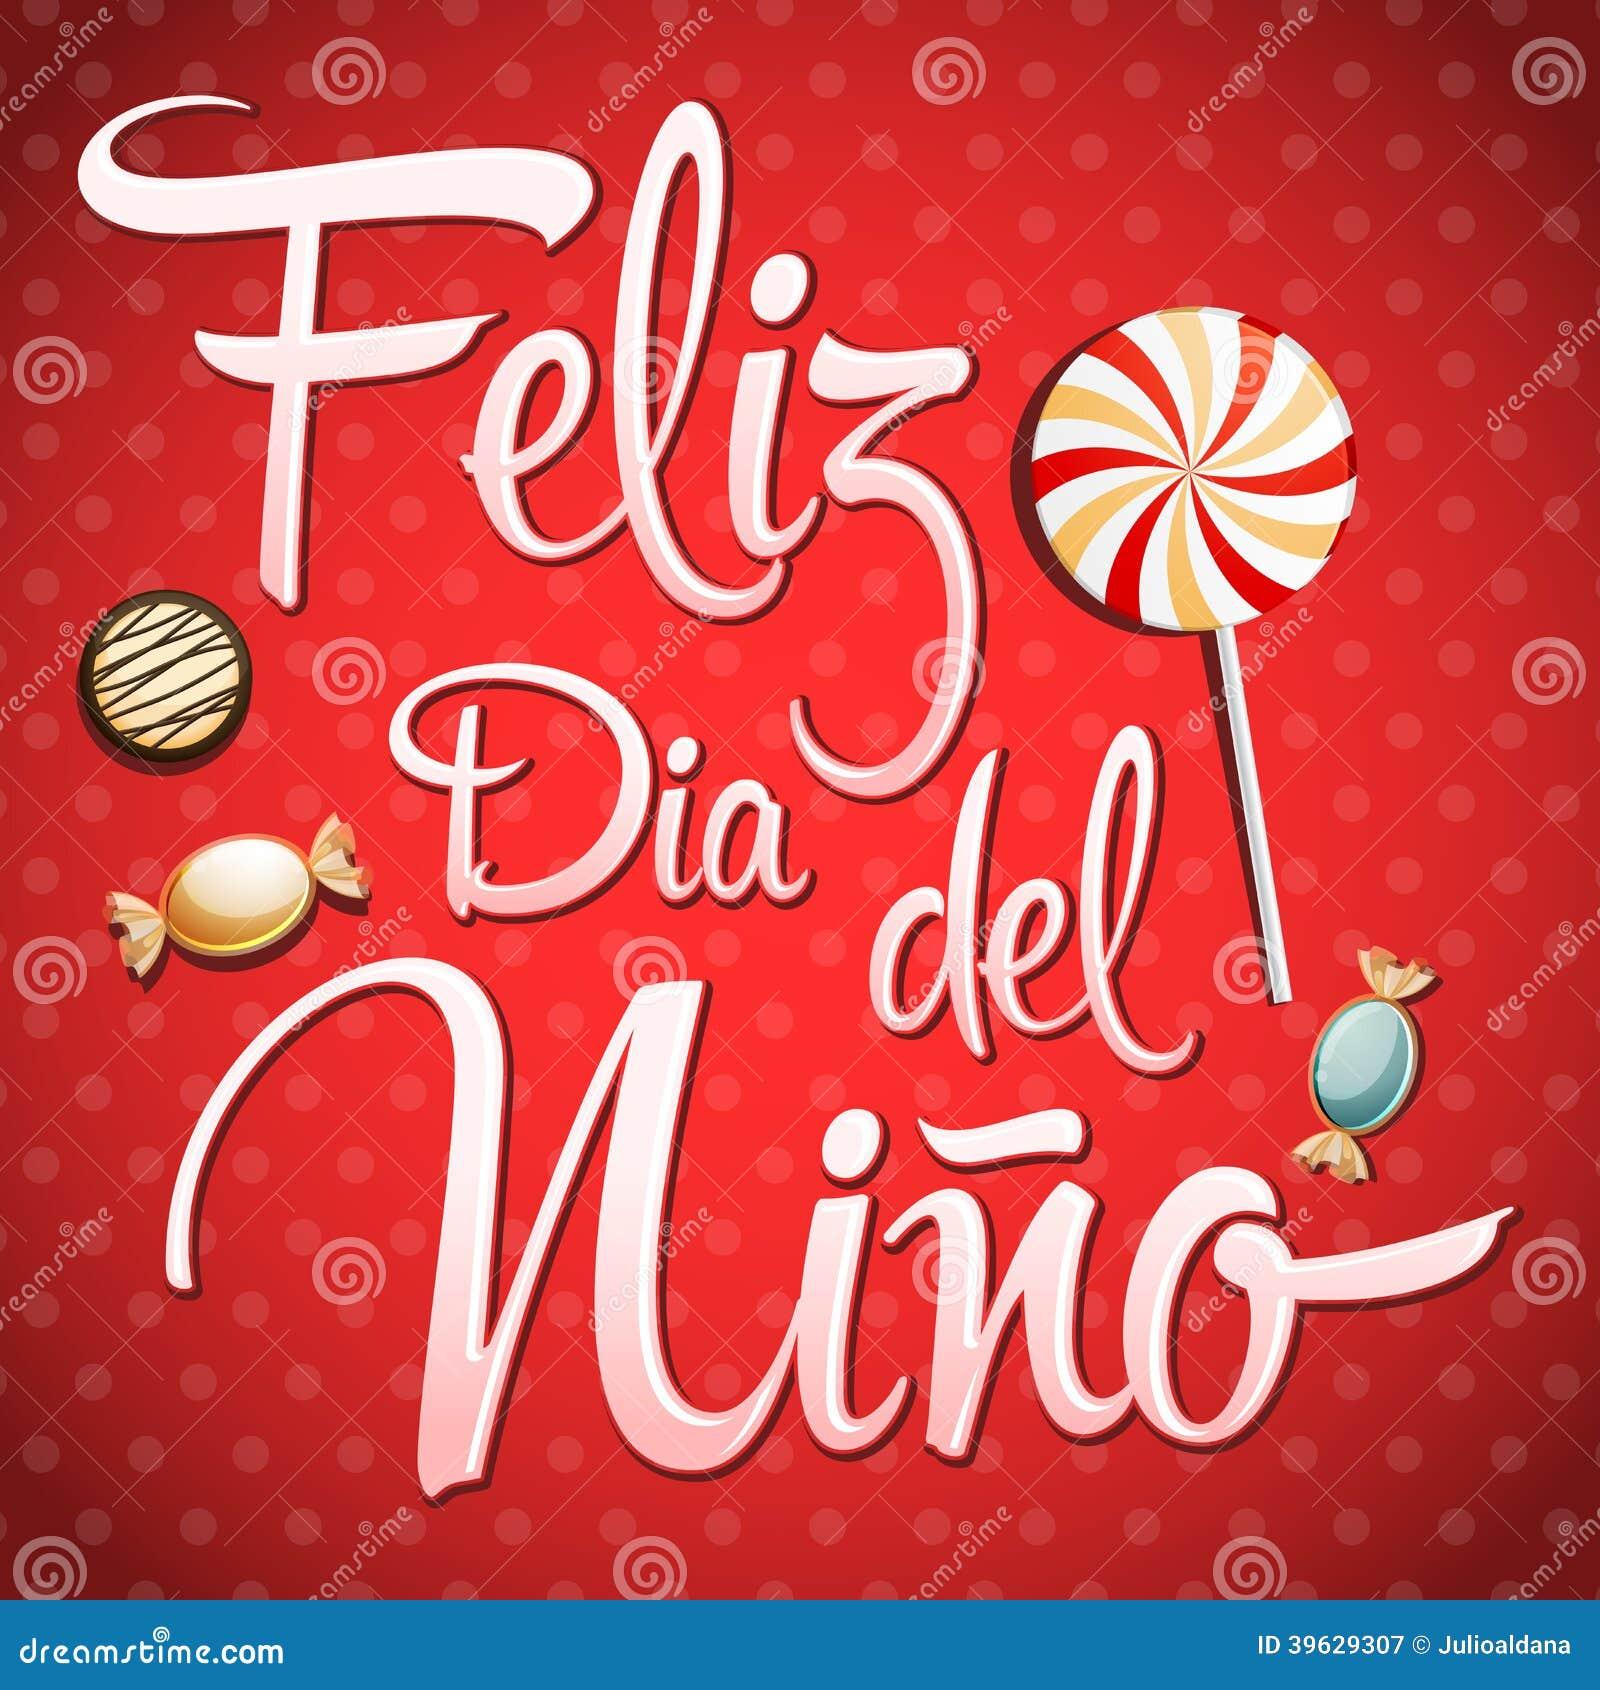 Feliz Dia Del Nino Happy Children Day Text In Spanish